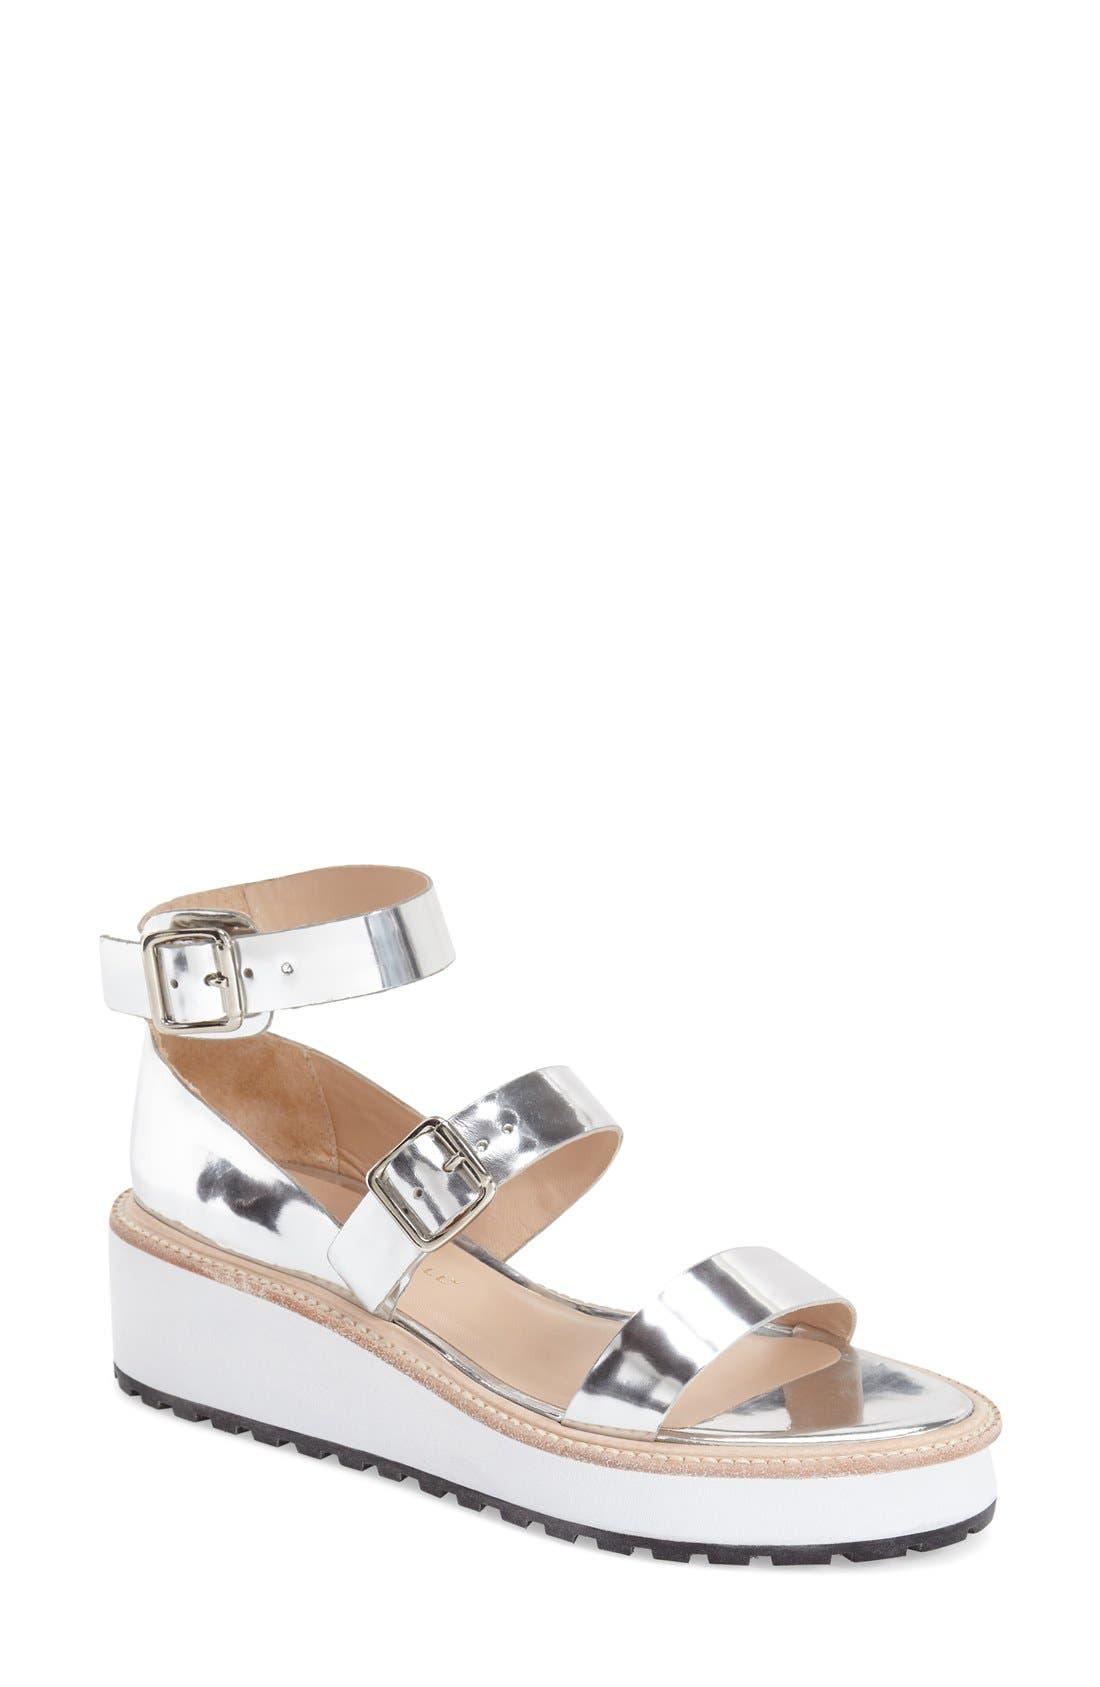 Alternate Image 1 Selected - Loeffler Randall 'Pia' Platform Wedge Sandal (Women)